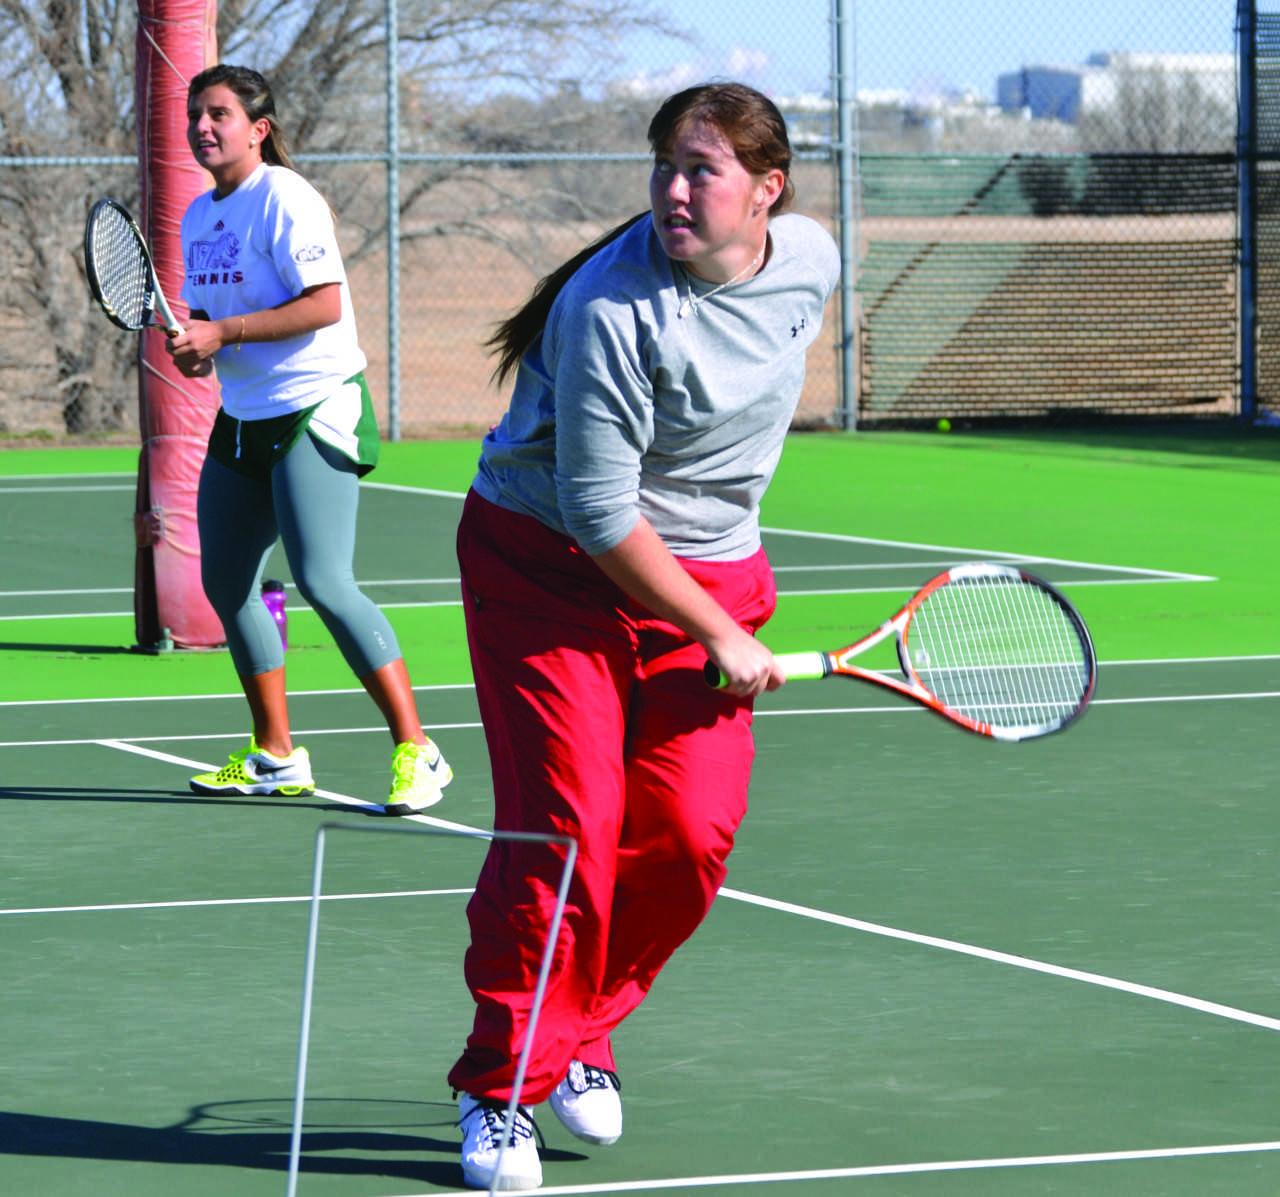 New player joins Lady Saints tennis